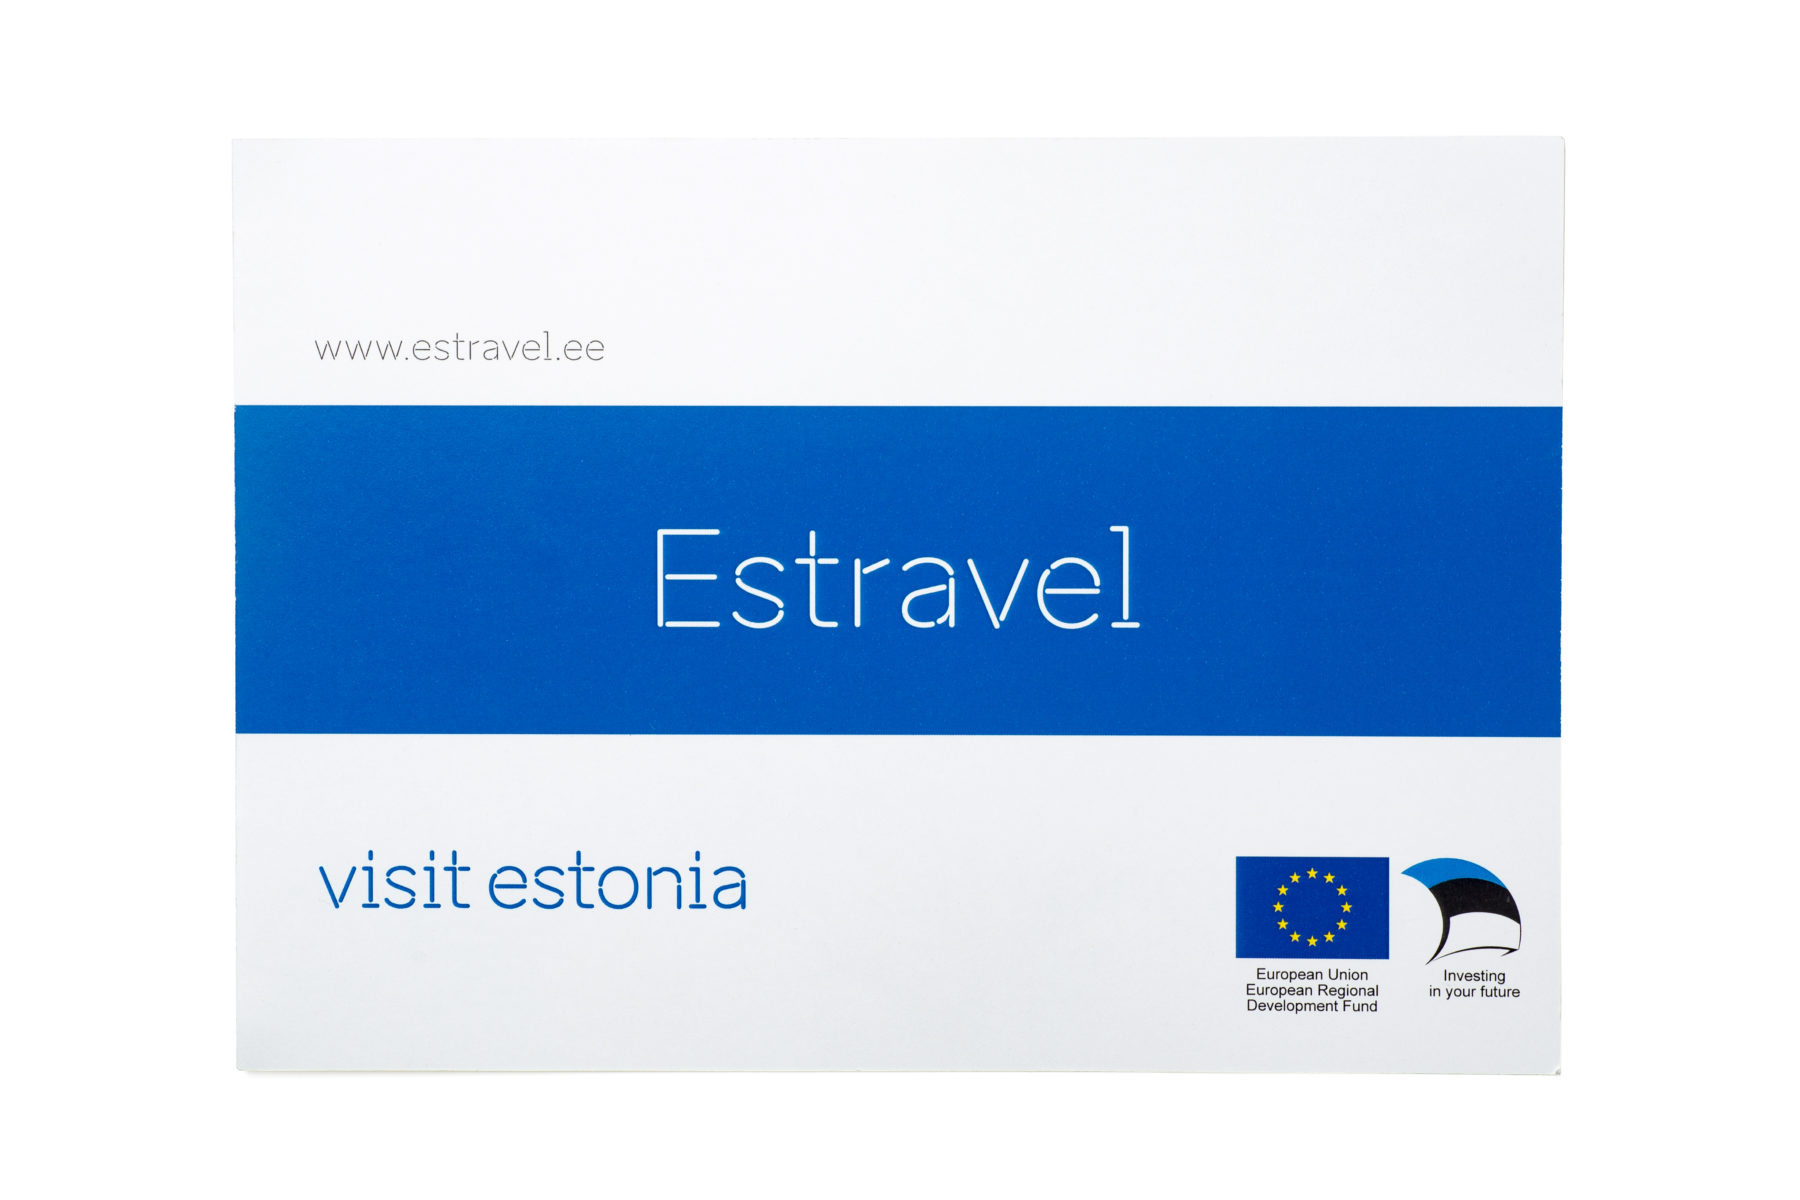 Estravel booklet cover